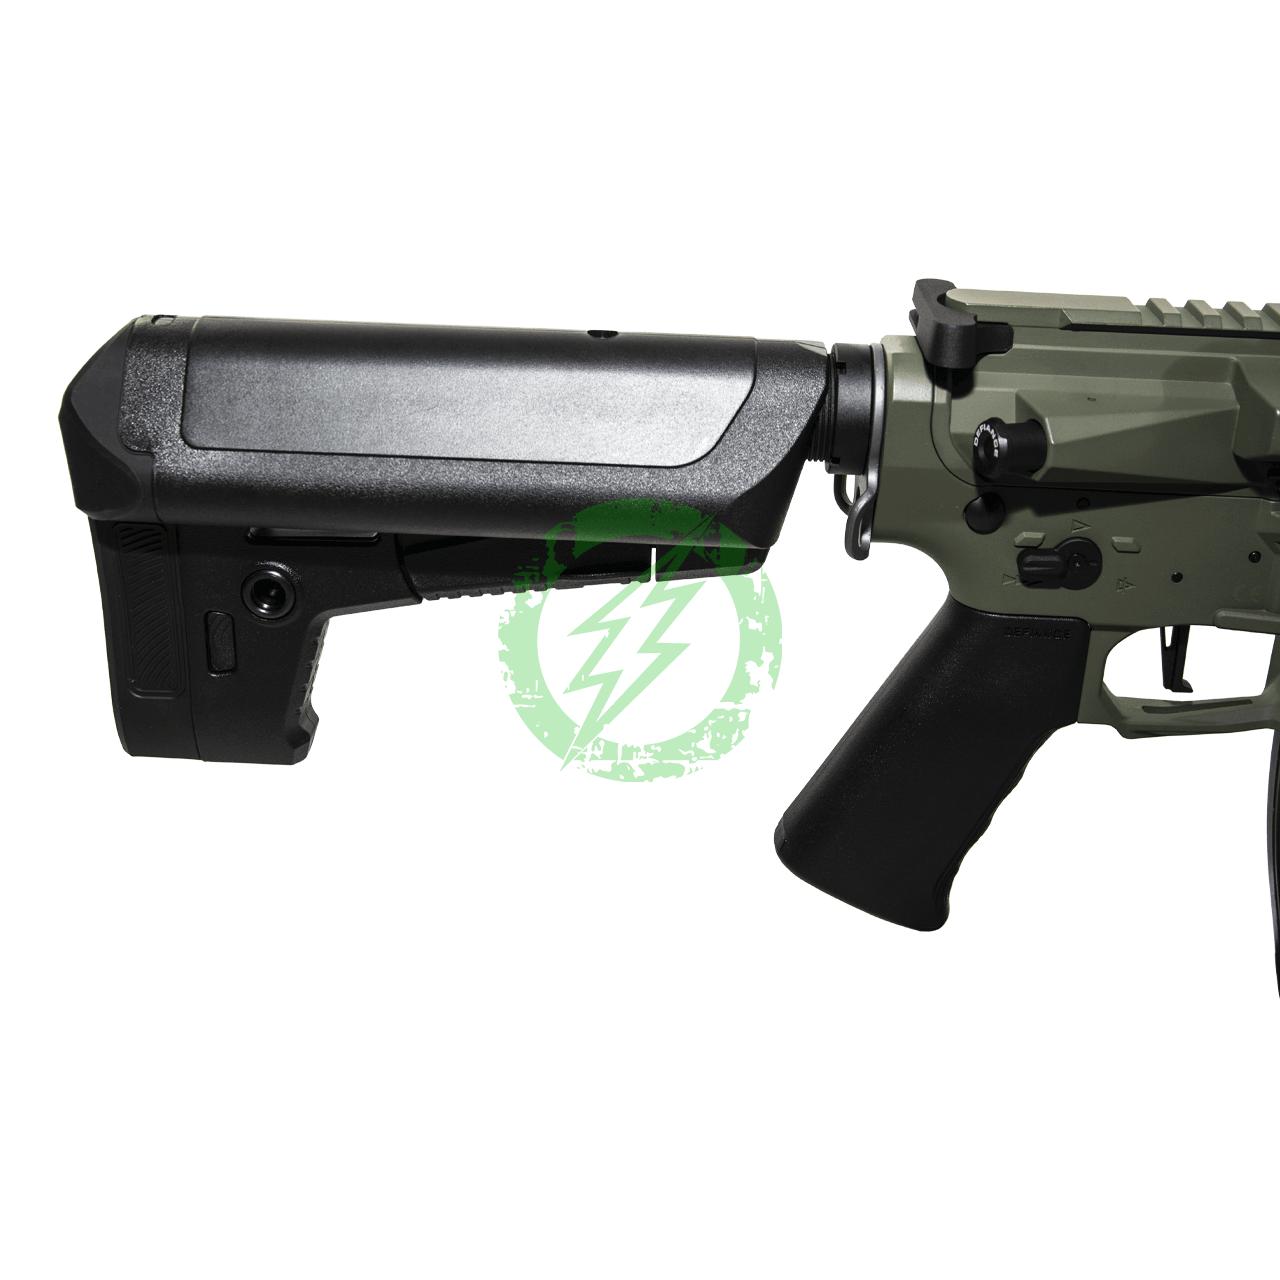 Krytac Full Metal Trident MKII-M SPR Rifle   Foliage Green   MLOK Stock